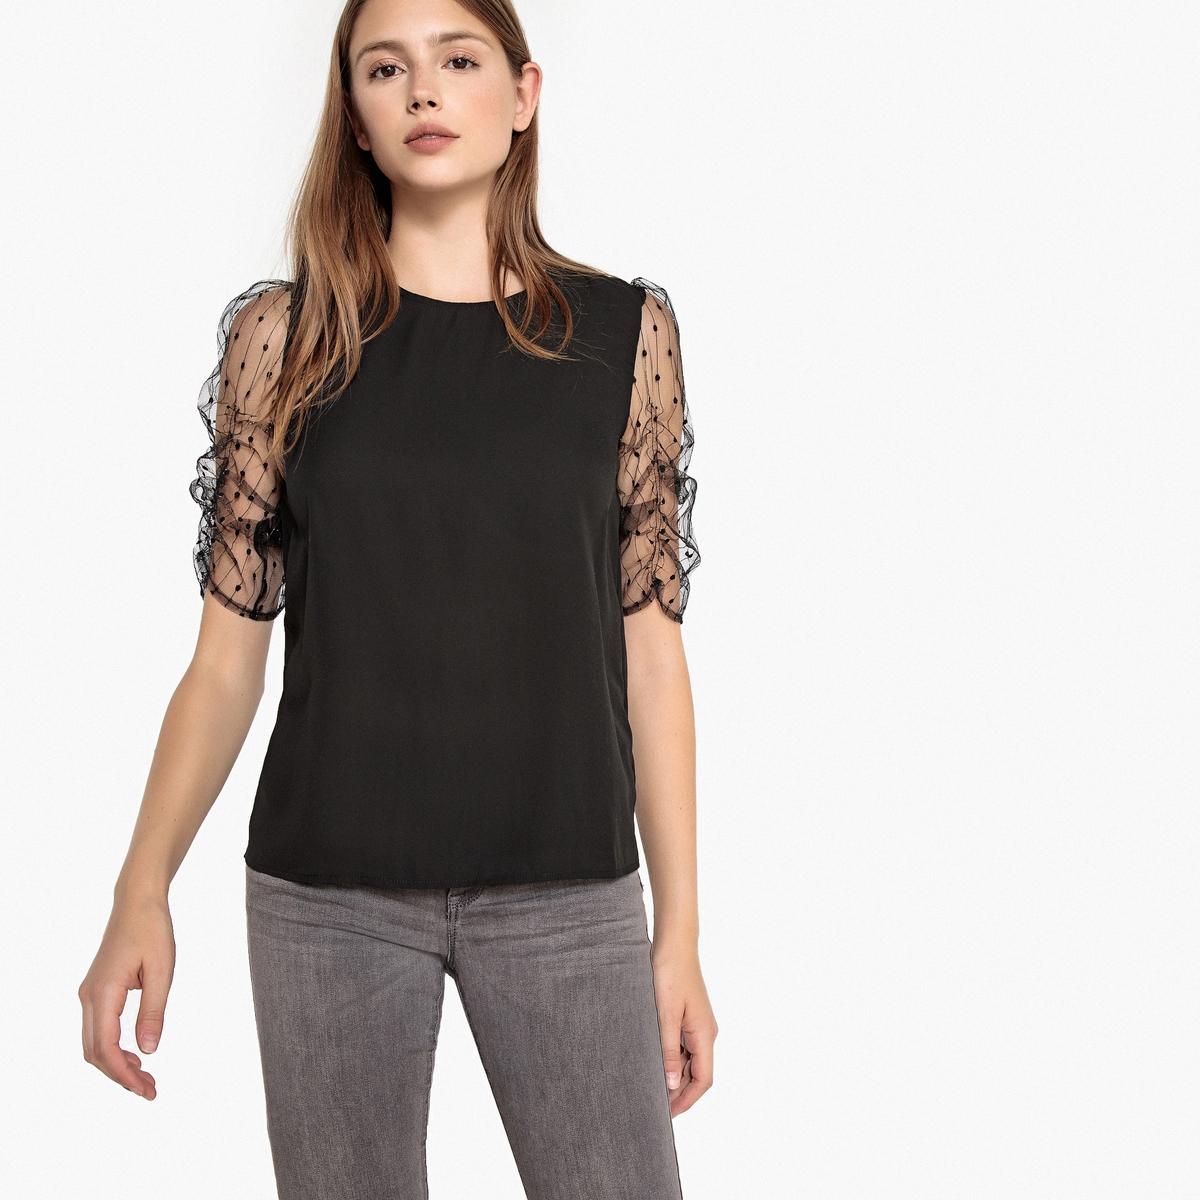 Блузка с круглым вырезом и короткими рукавами блузка best mountaine